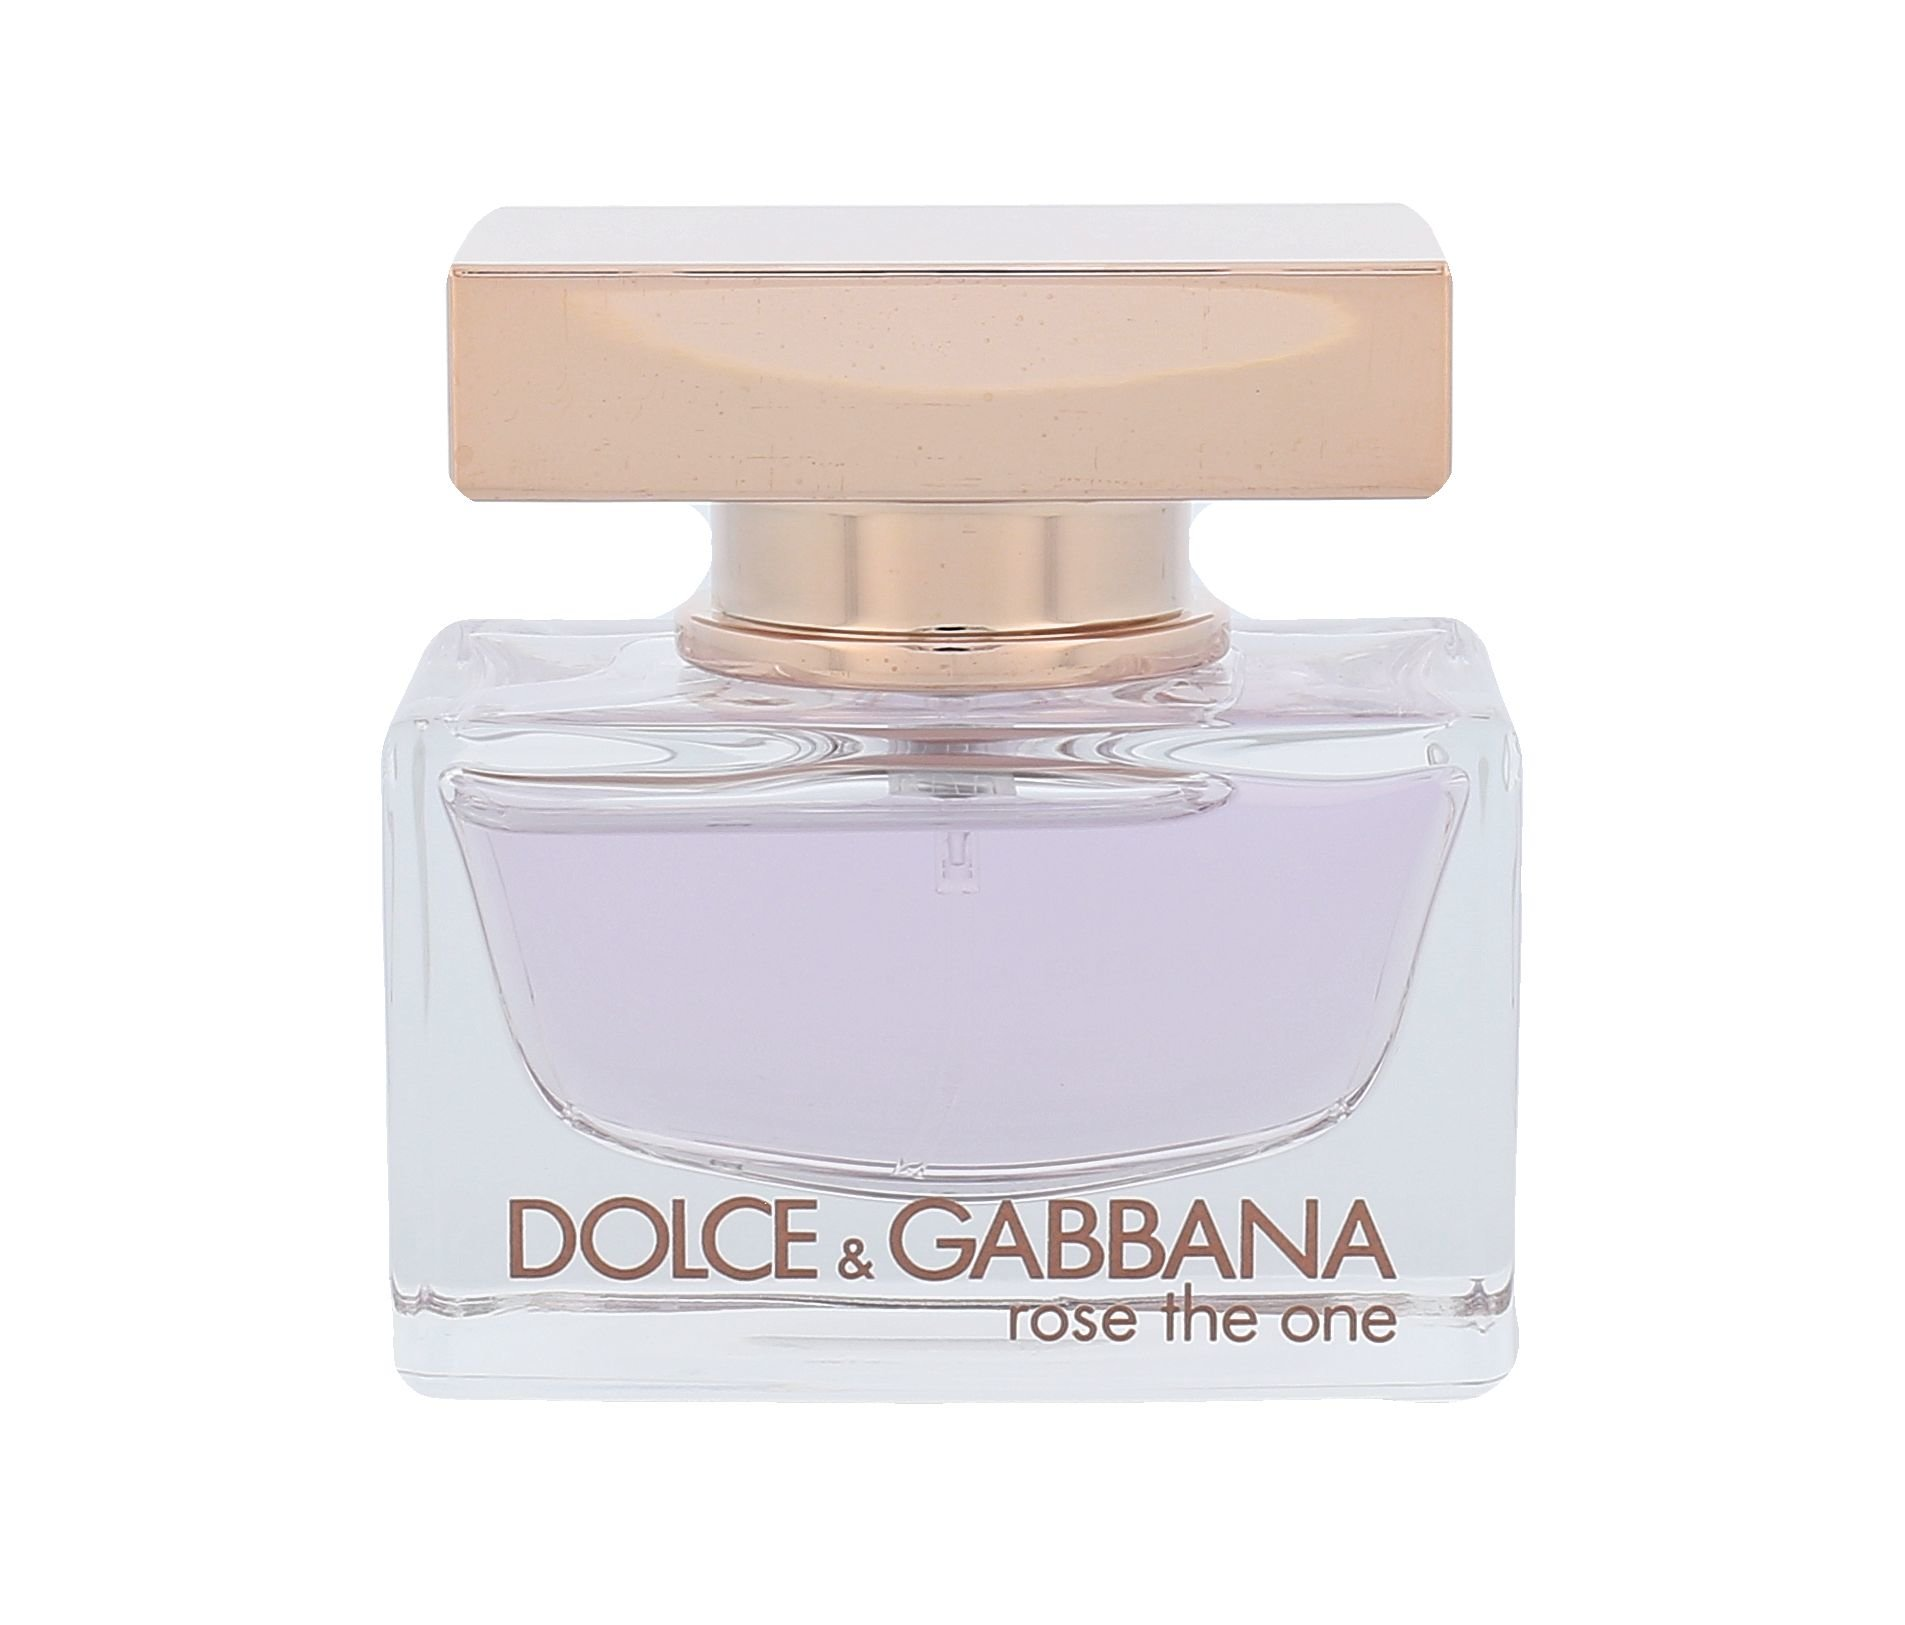 Dolce&Gabbana The One Rose, Parfumovaná voda 30ml